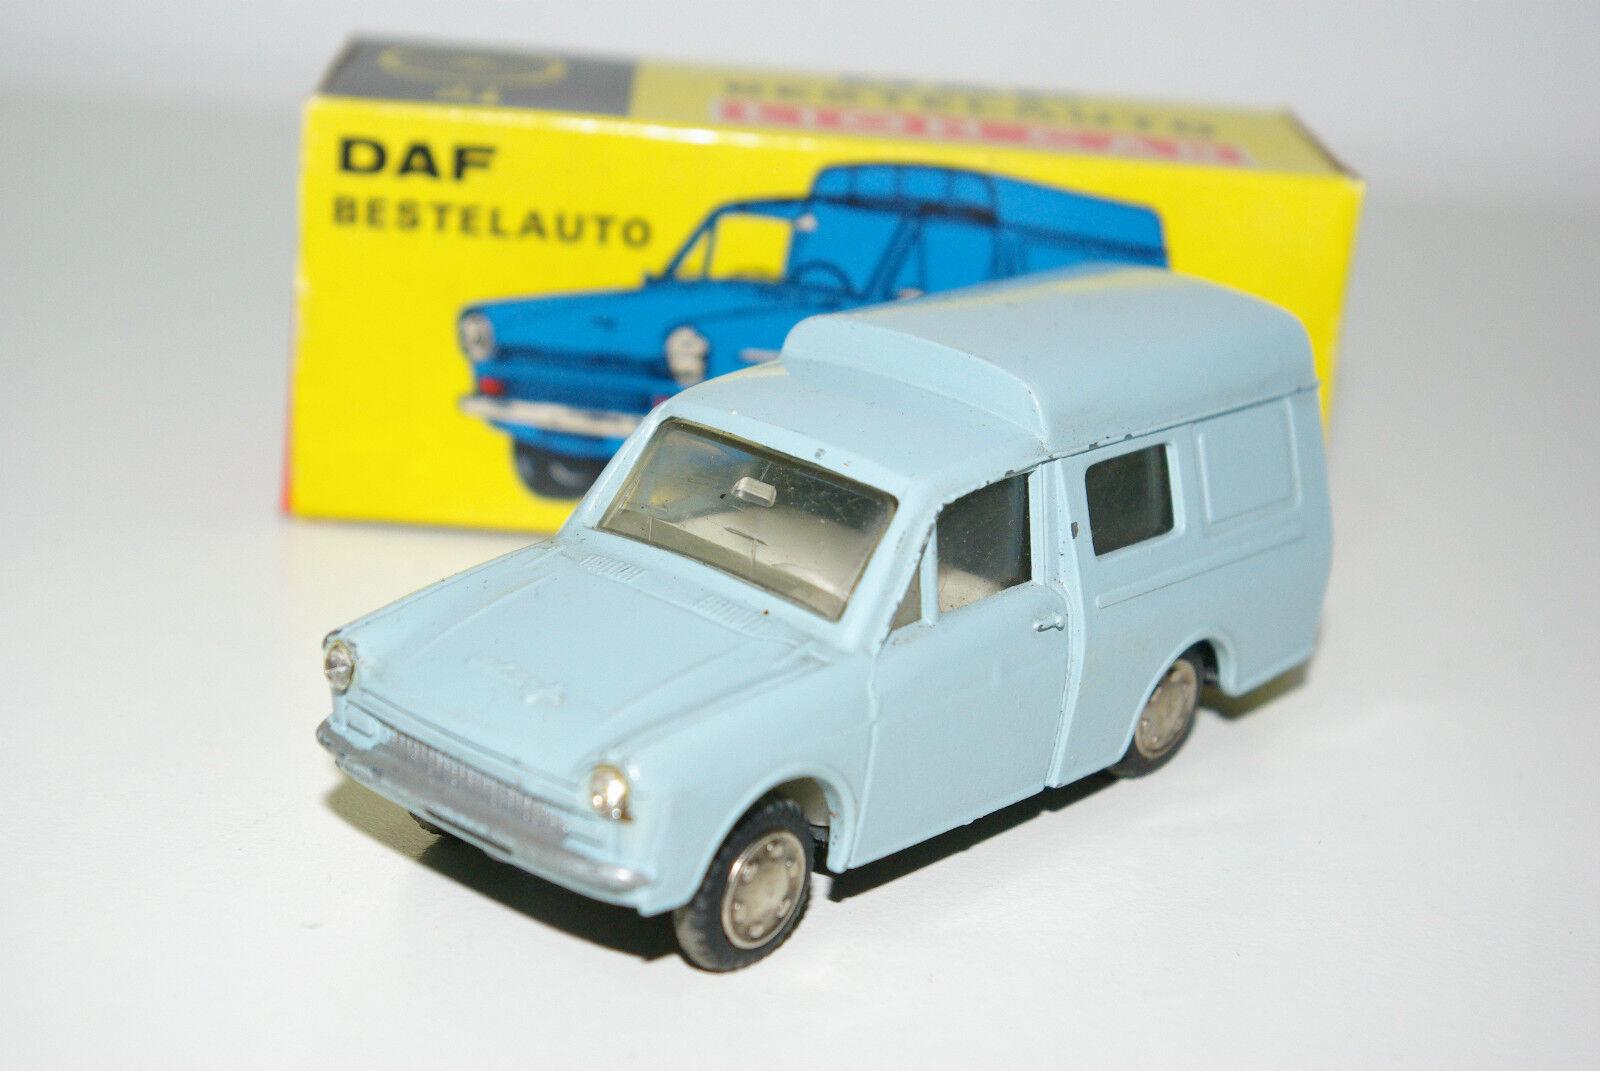 LION CAR DAF 33 VARIOMATIC commandé Van Light bleu Presque comme neuf Processeur en Boîte RARE RARE RARO